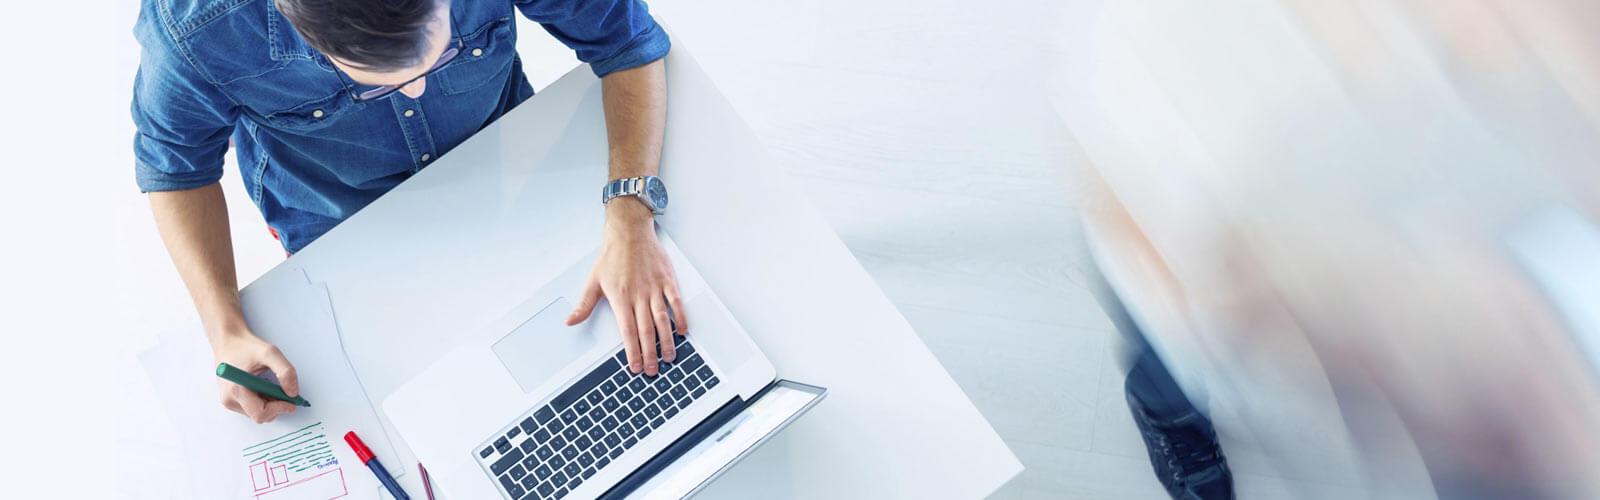 Sydney's Leading Digital Marketing Agency